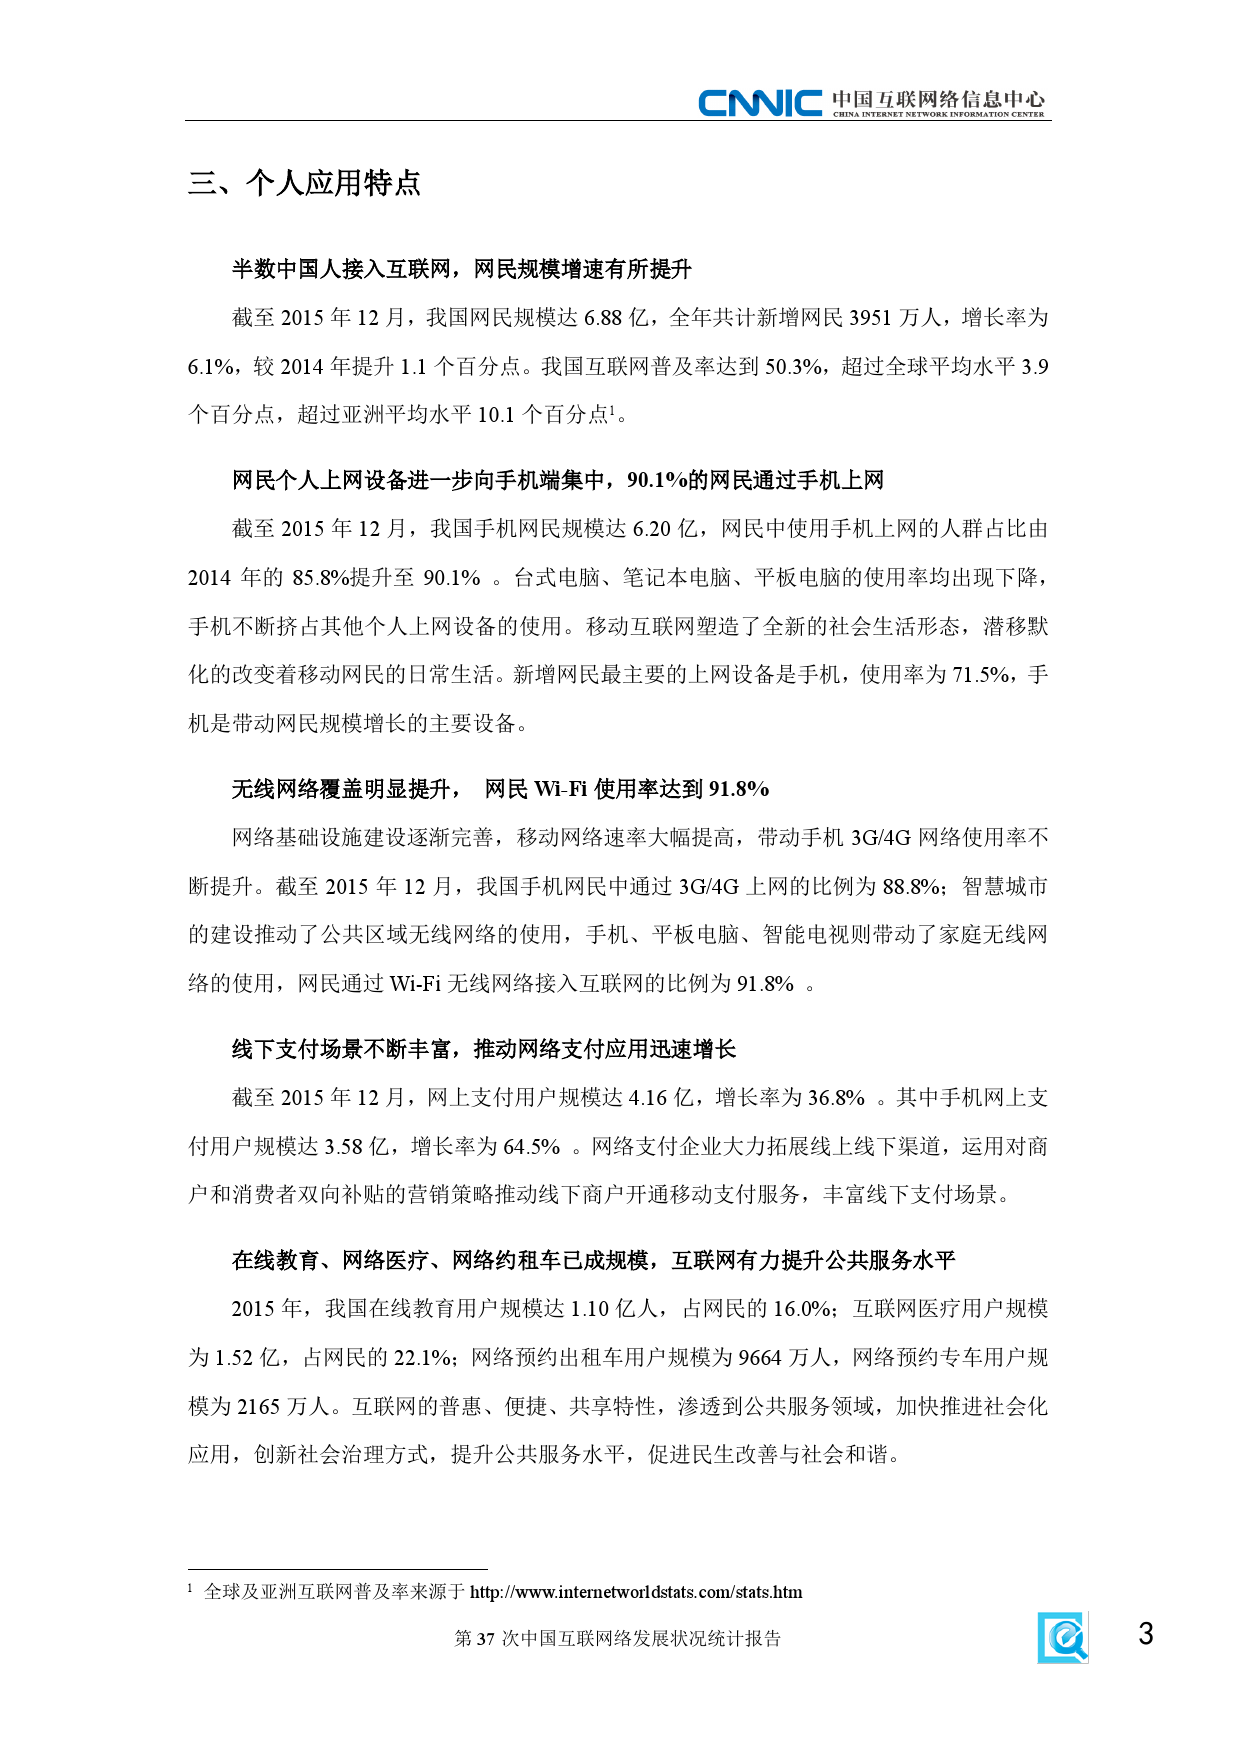 CNNIC:2015年第37次中国互联网络发展状况统计报告